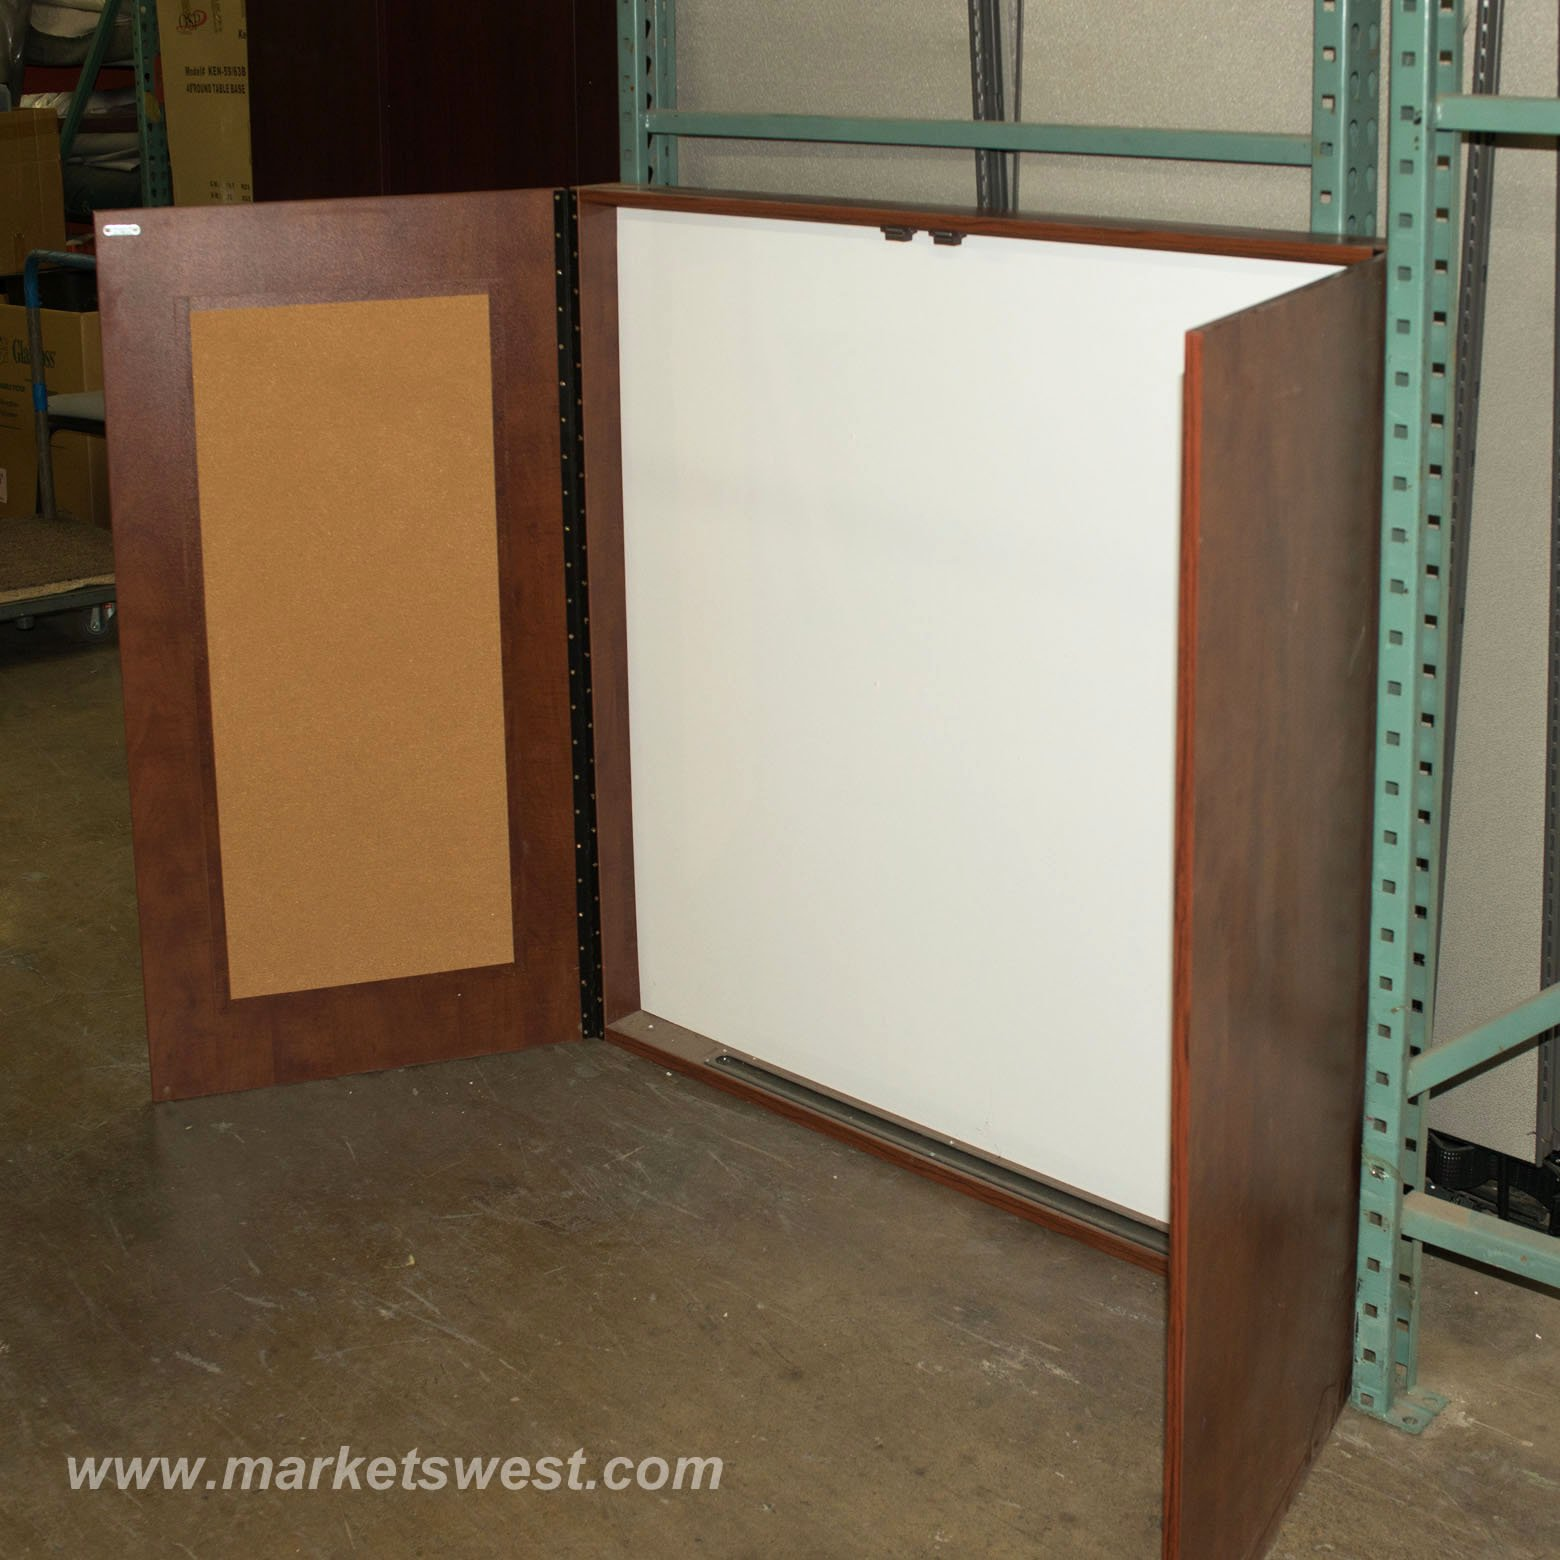 Mahogany Visual Presentation Board Used